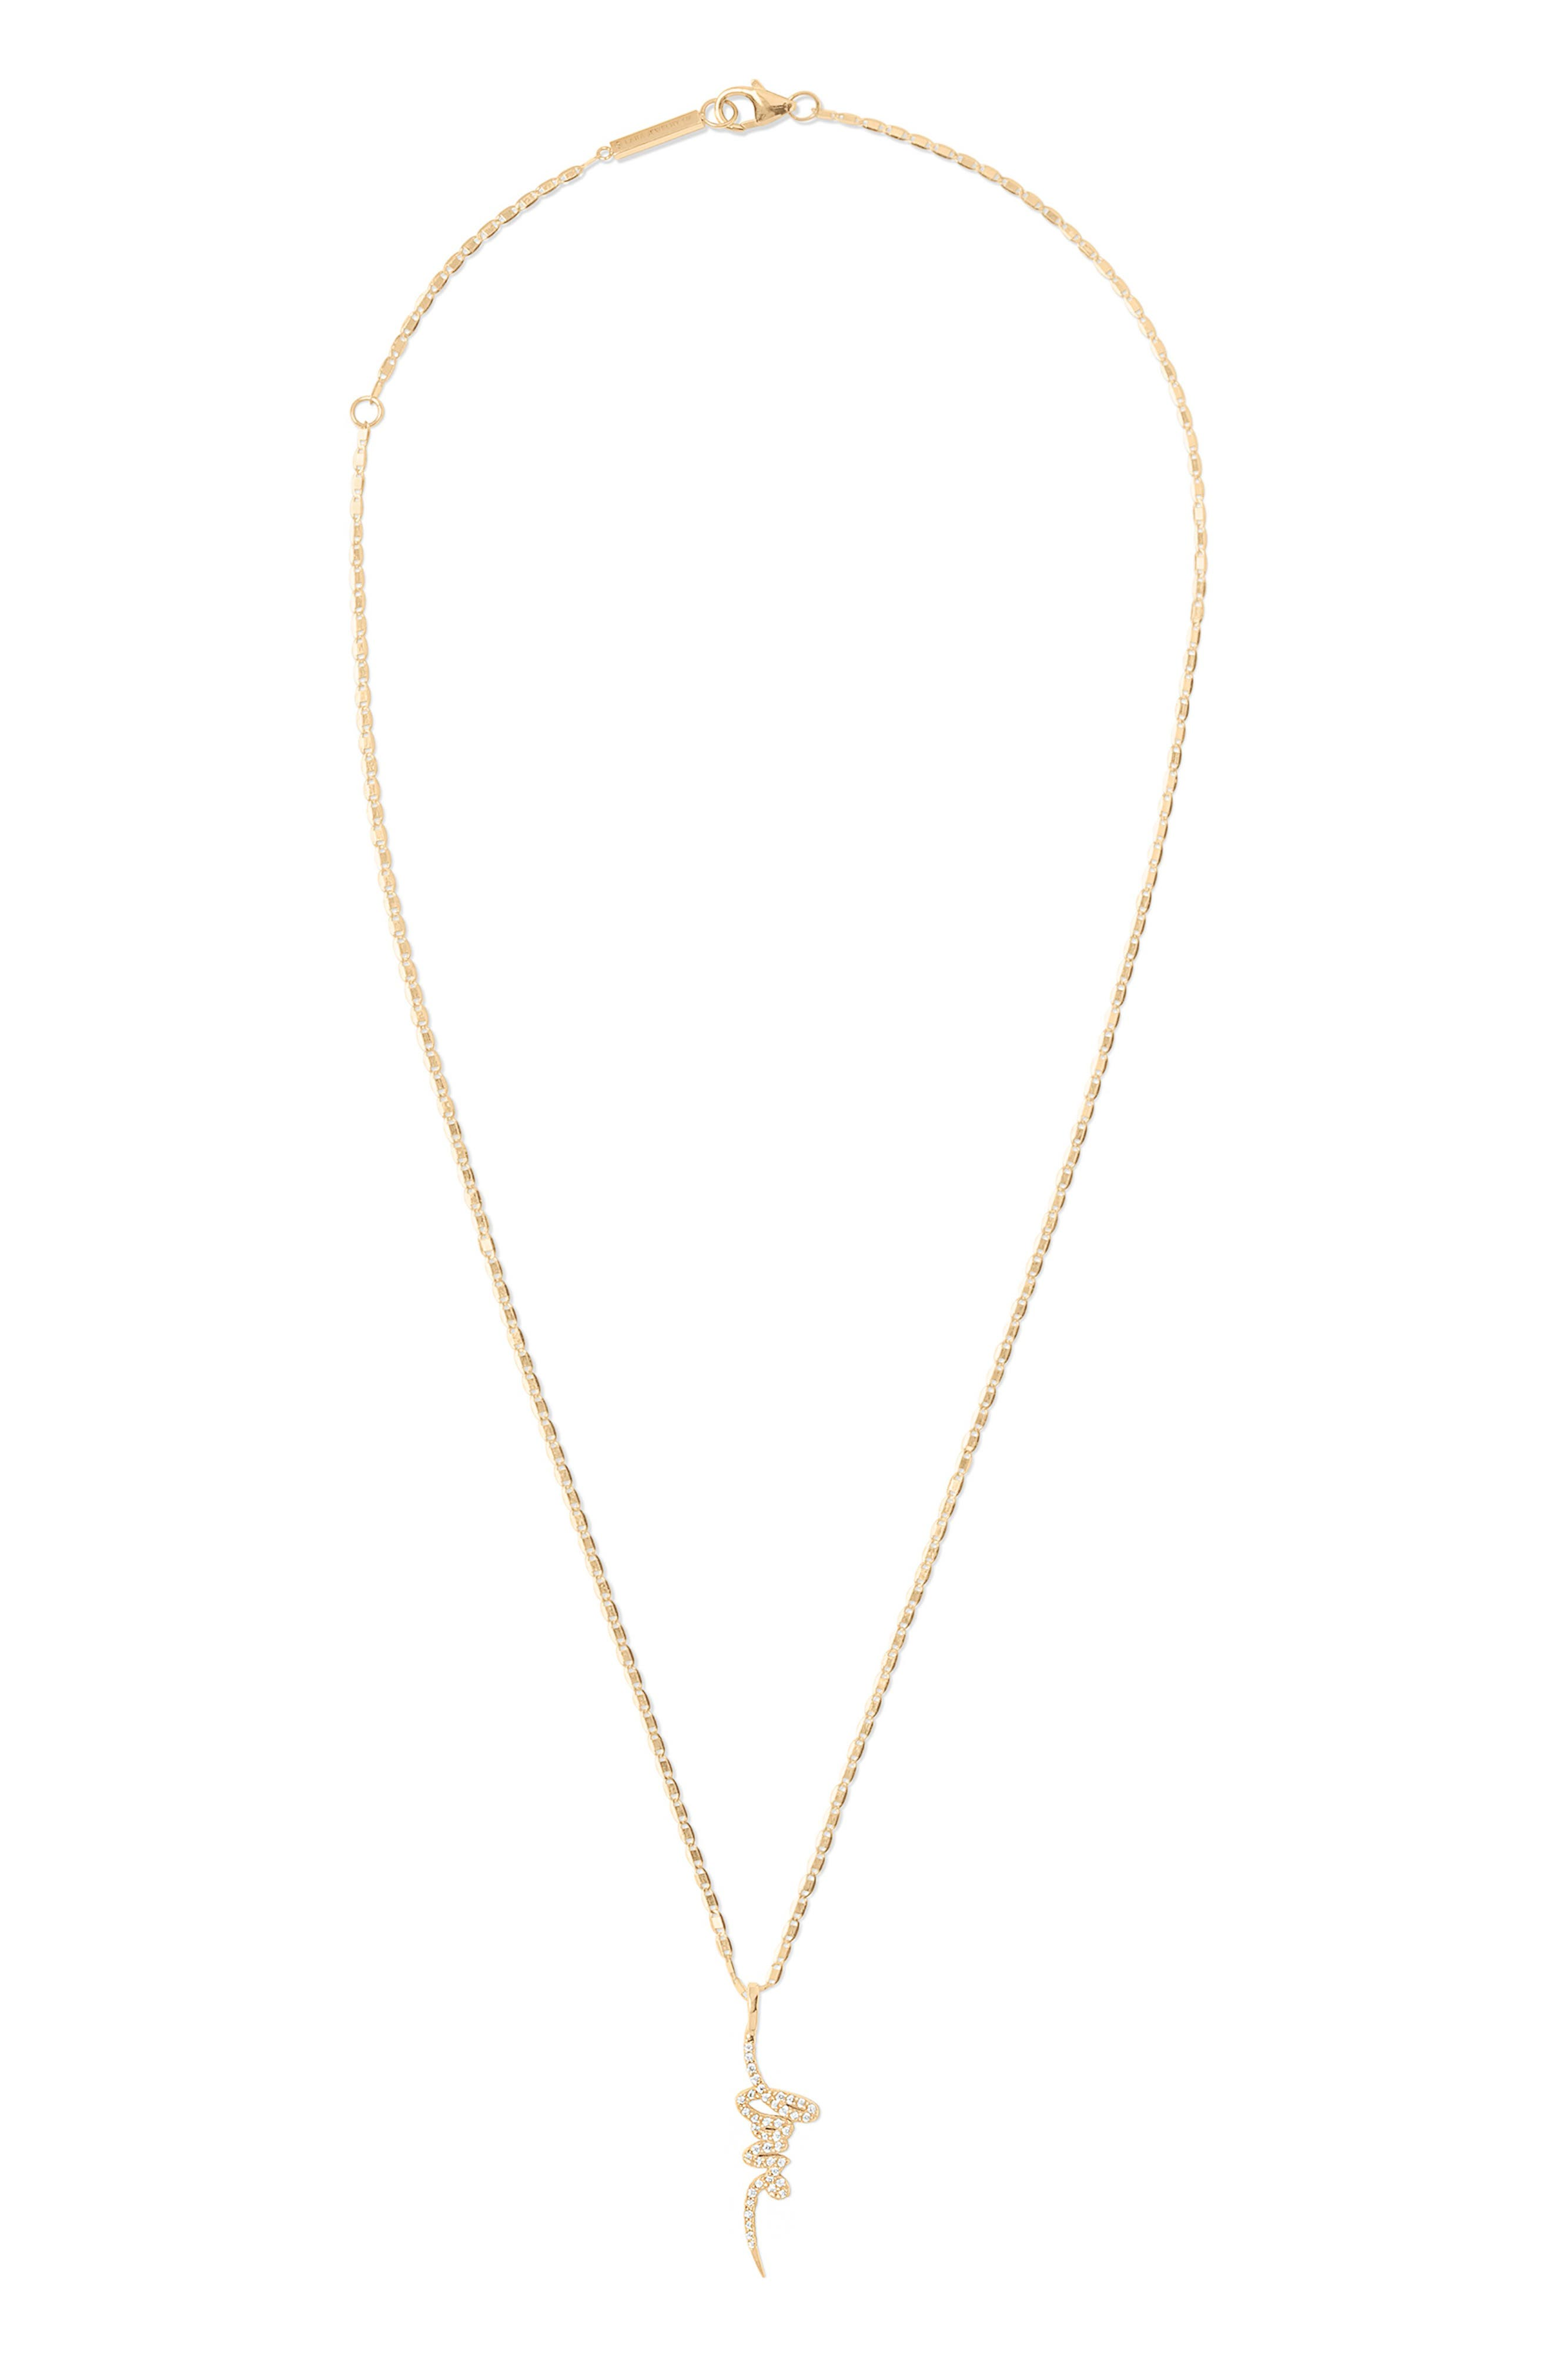 Flawless Diamond Love Pendant Necklace